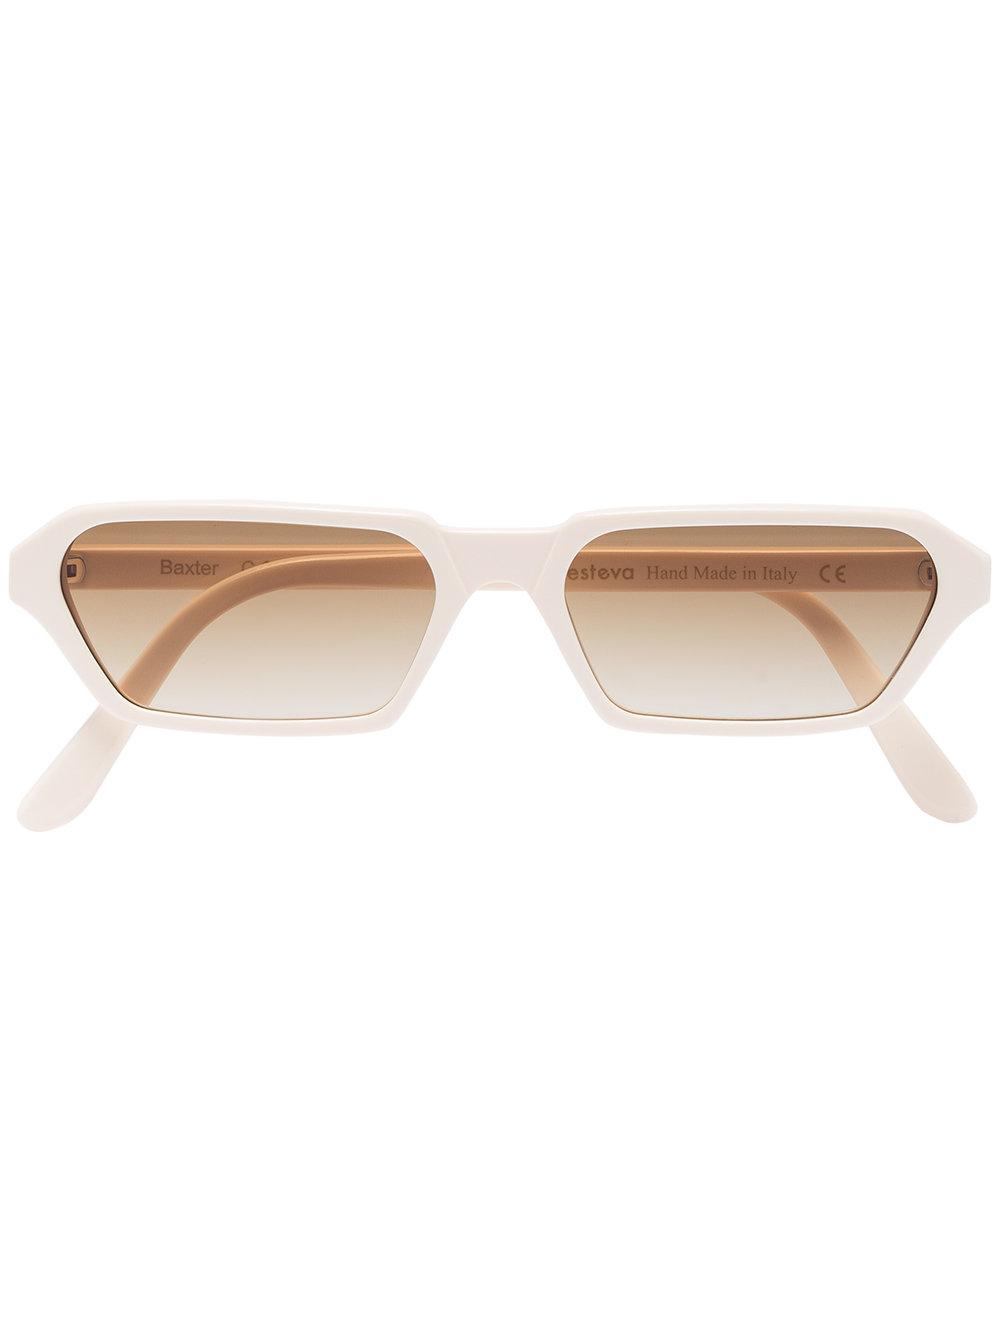 illesteva ivory baxter narrow sunglasses narrow rectangular sunglasses small sunglasses trend 90s sunglasses where to buy tiny sunglasses tiny 90s sunglasses narrow frame sunglasses tiny sunglasses trend